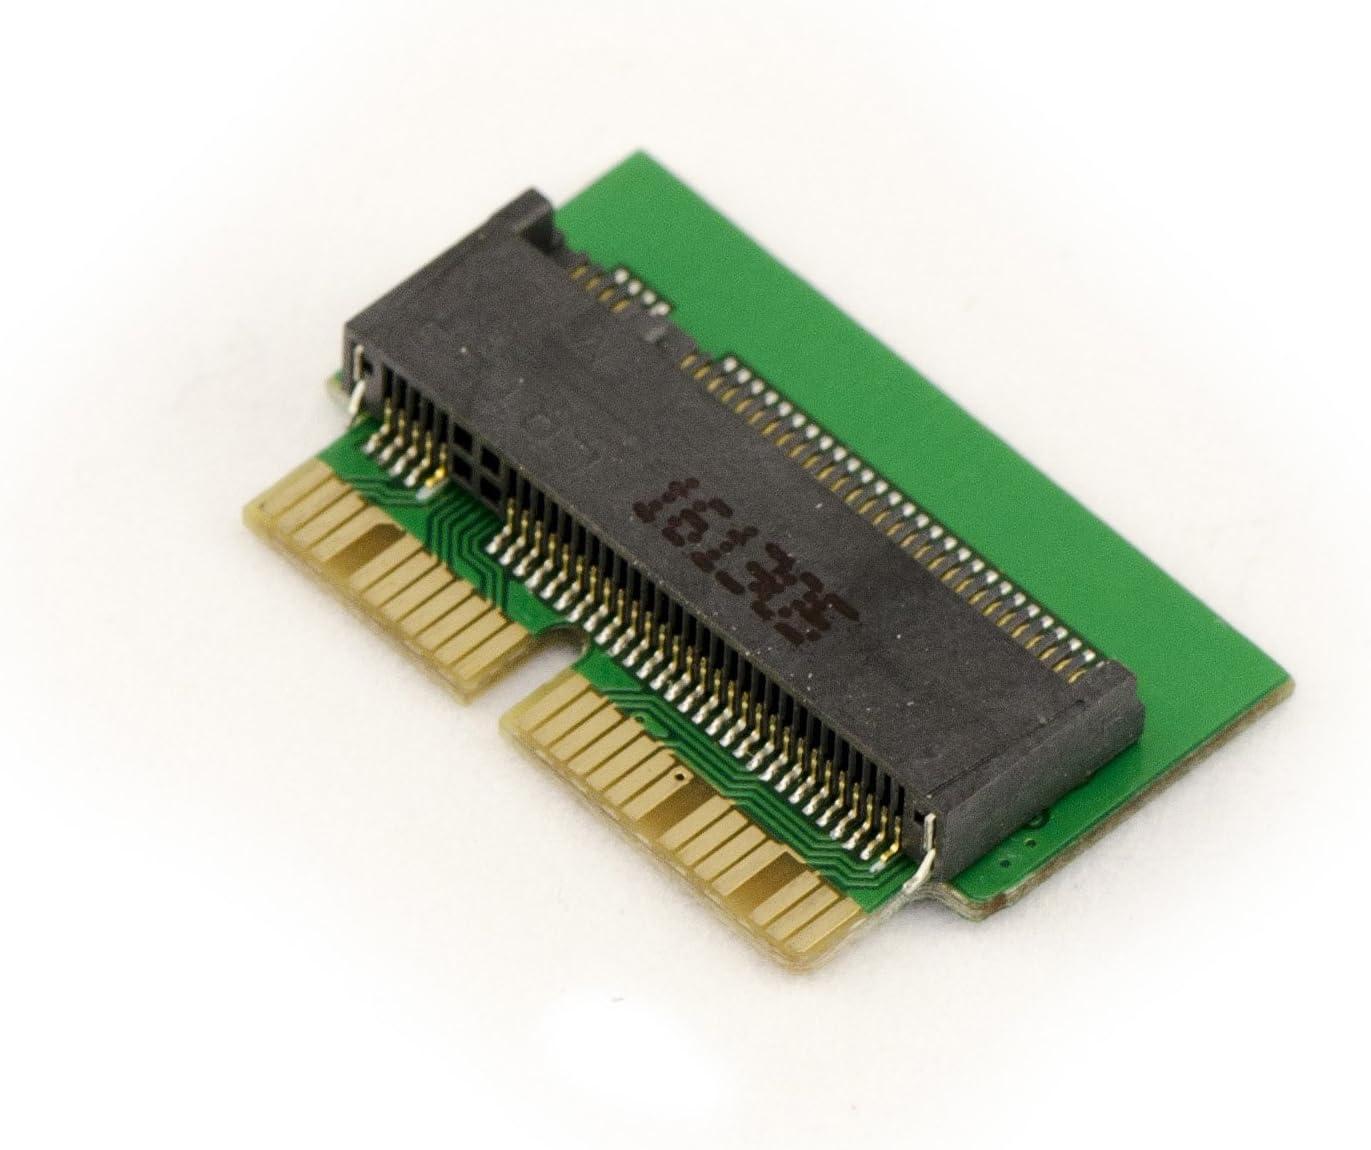 M.2 (NGFF) SSD – Adaptador para reemplazar el original 12 + 16 pin ...